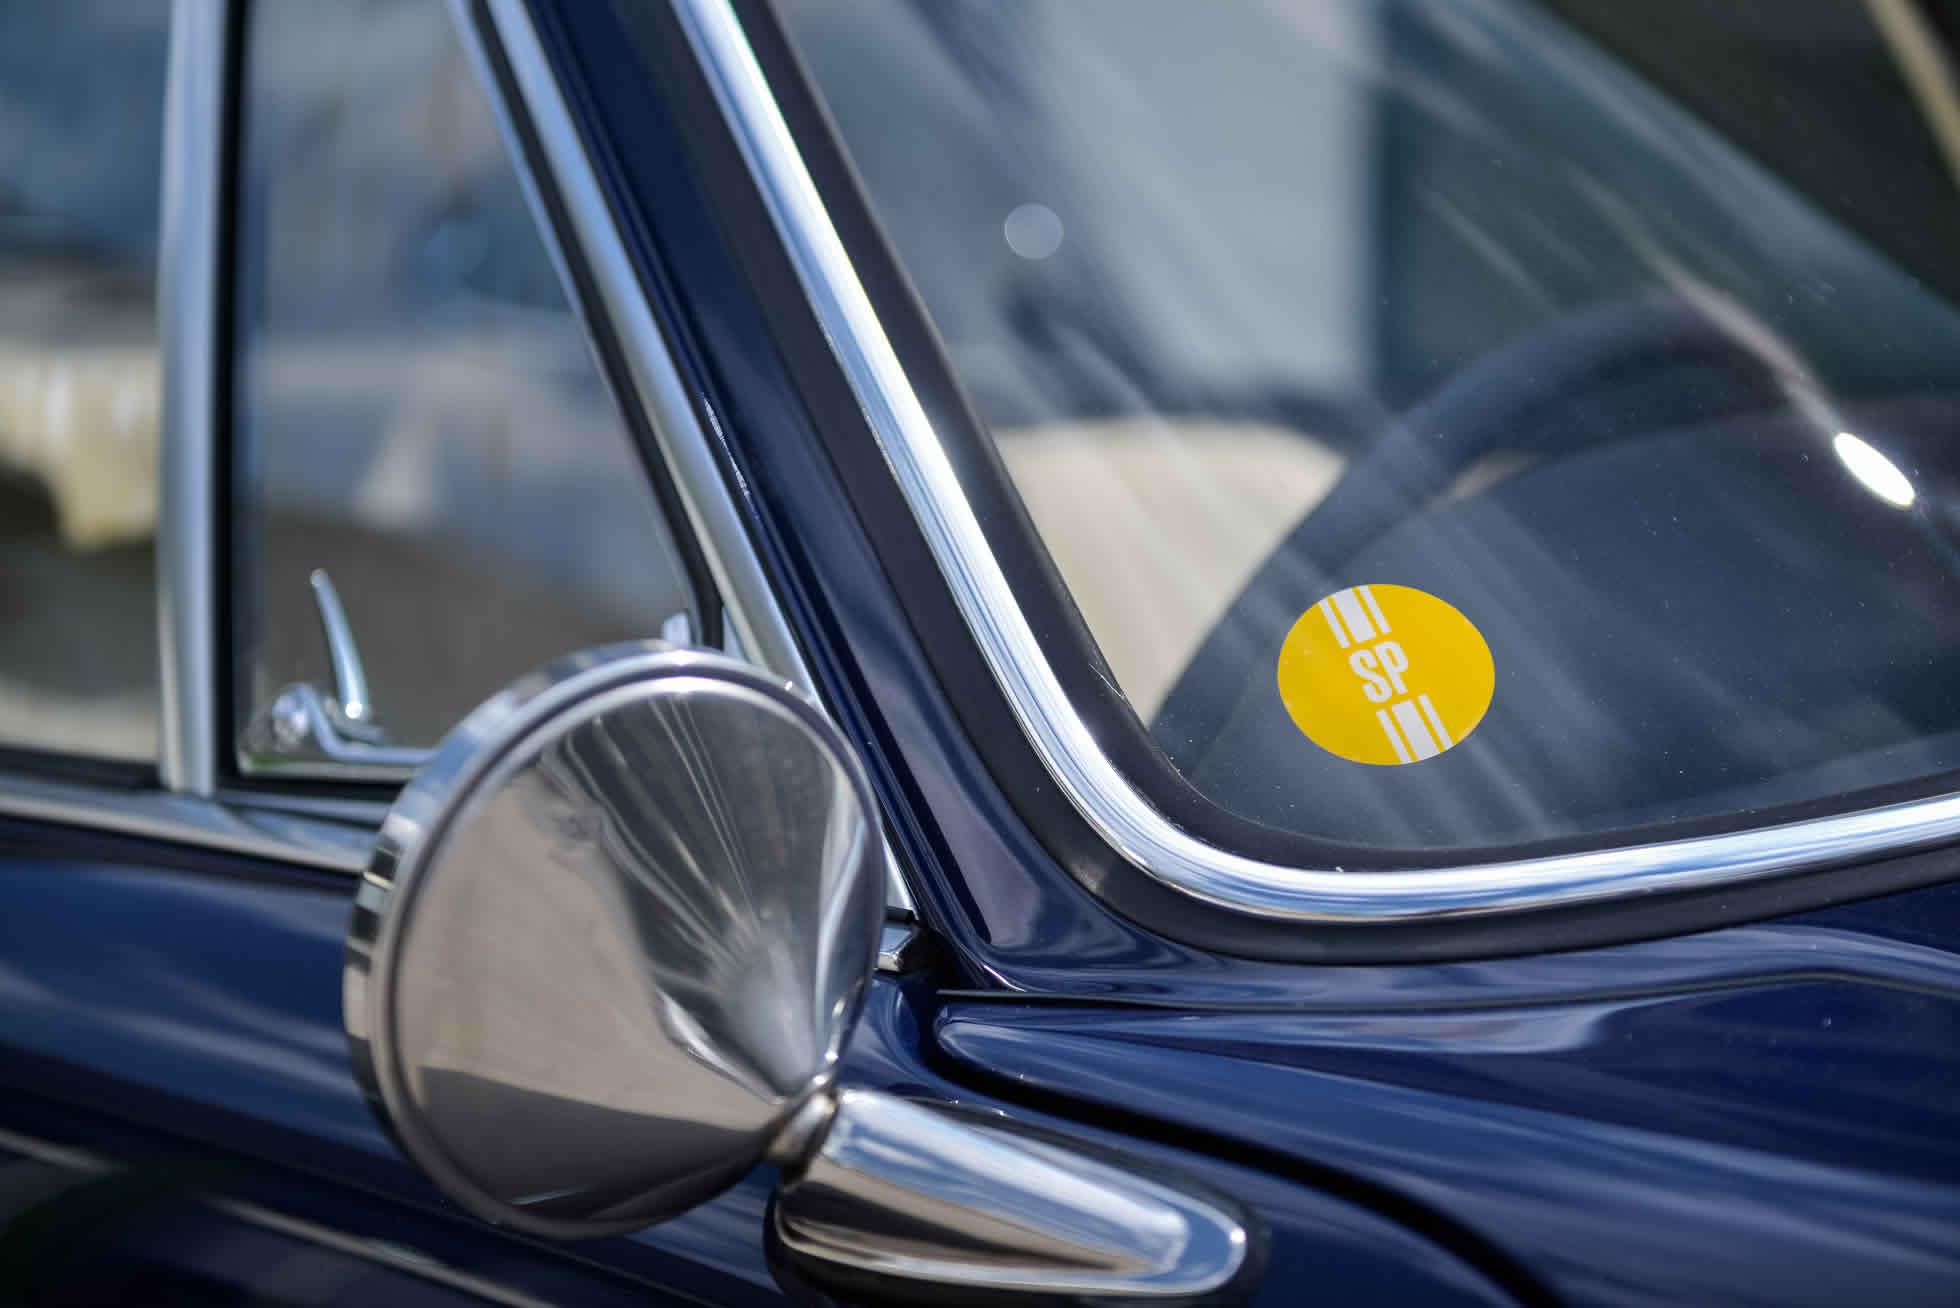 For Sale 1968 Porsche 911 S rear wing mirror